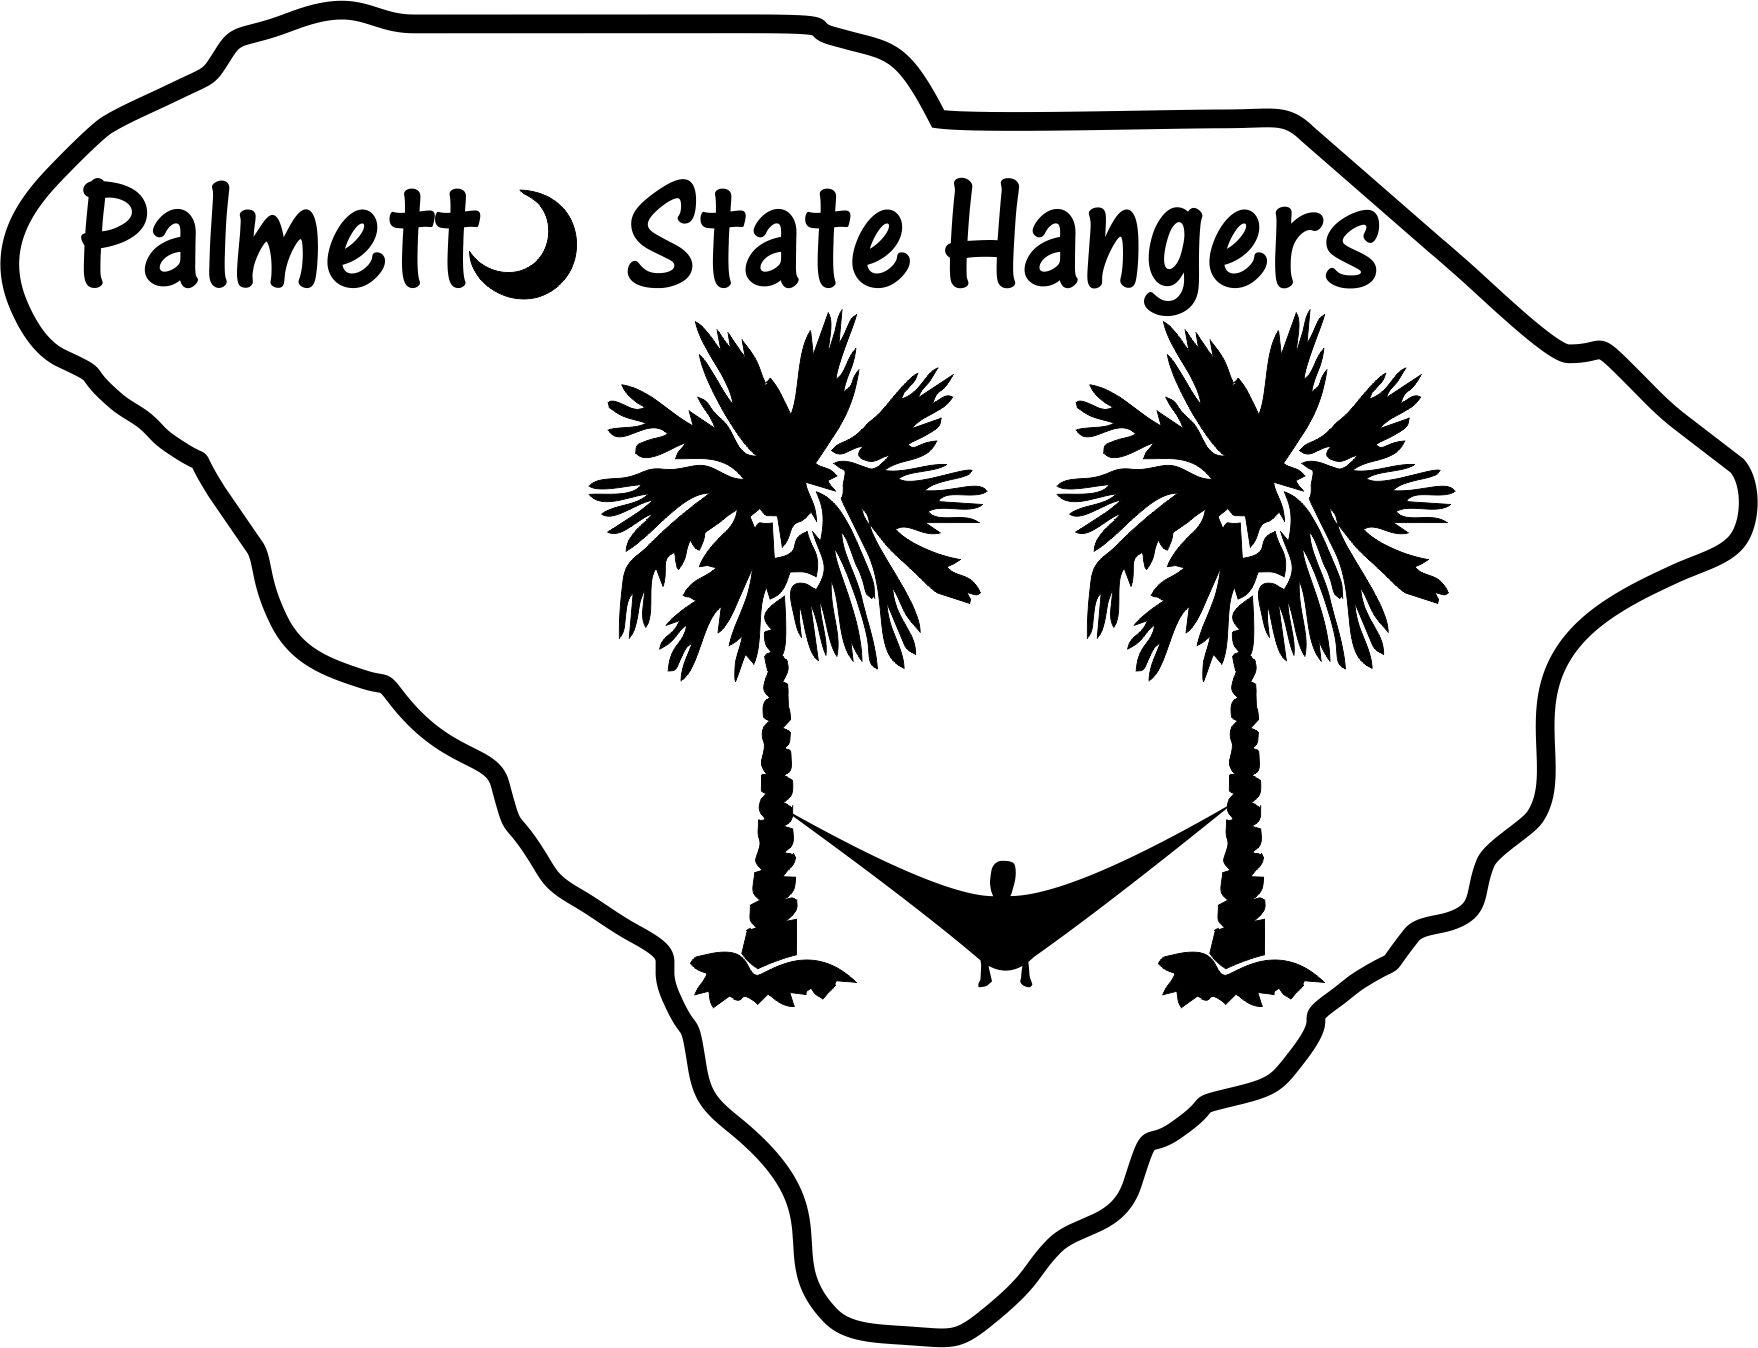 palmetto_state_hangers_jpg